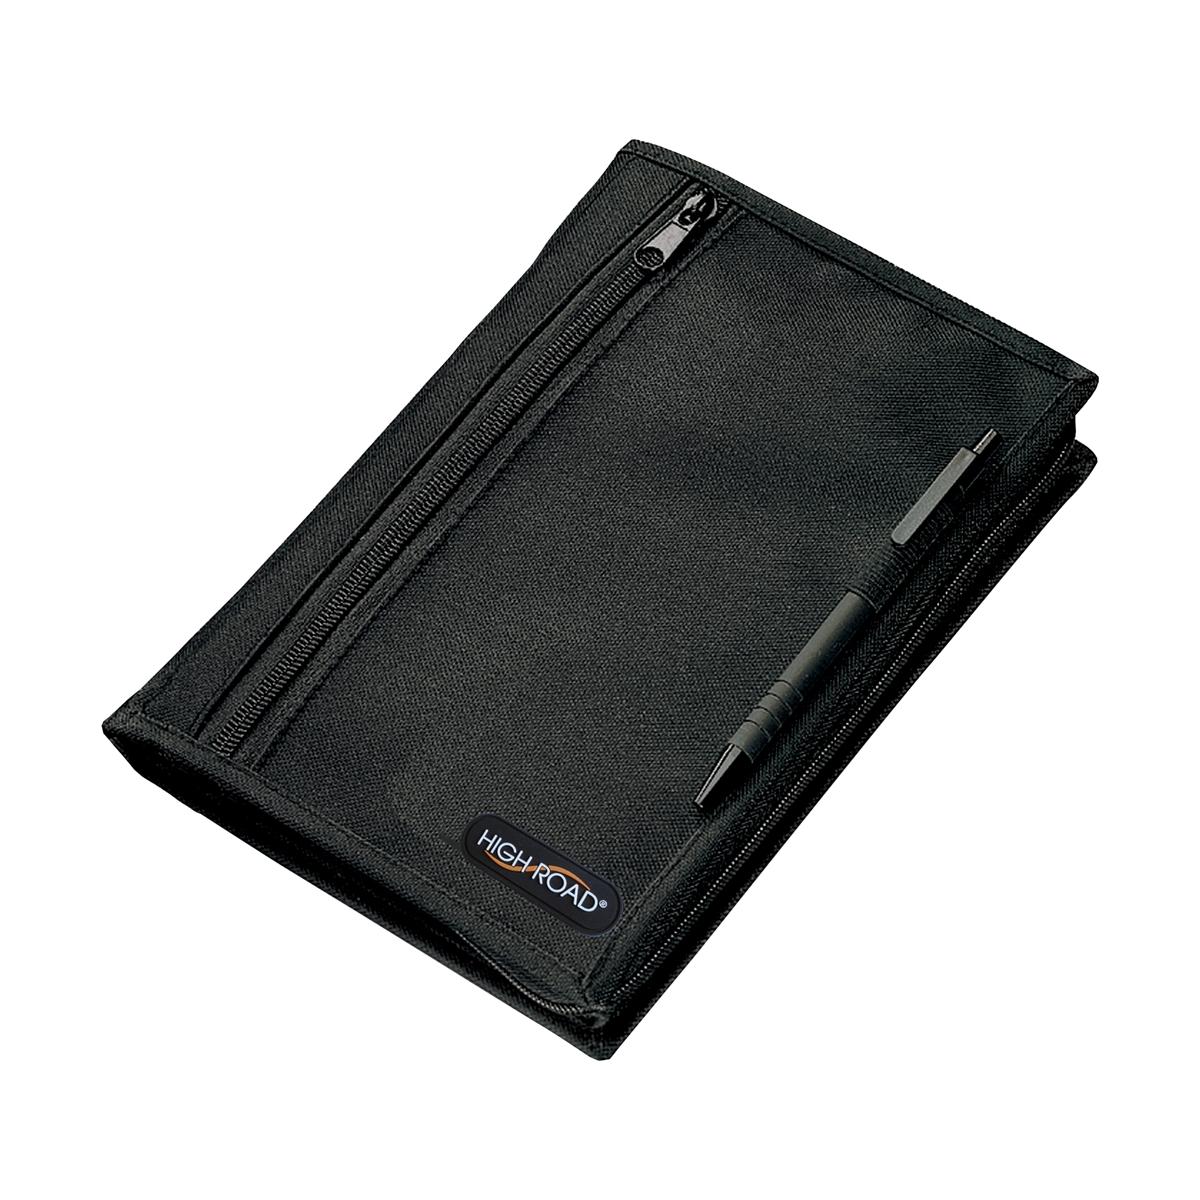 High Road Car Console and Glove Box Organizer